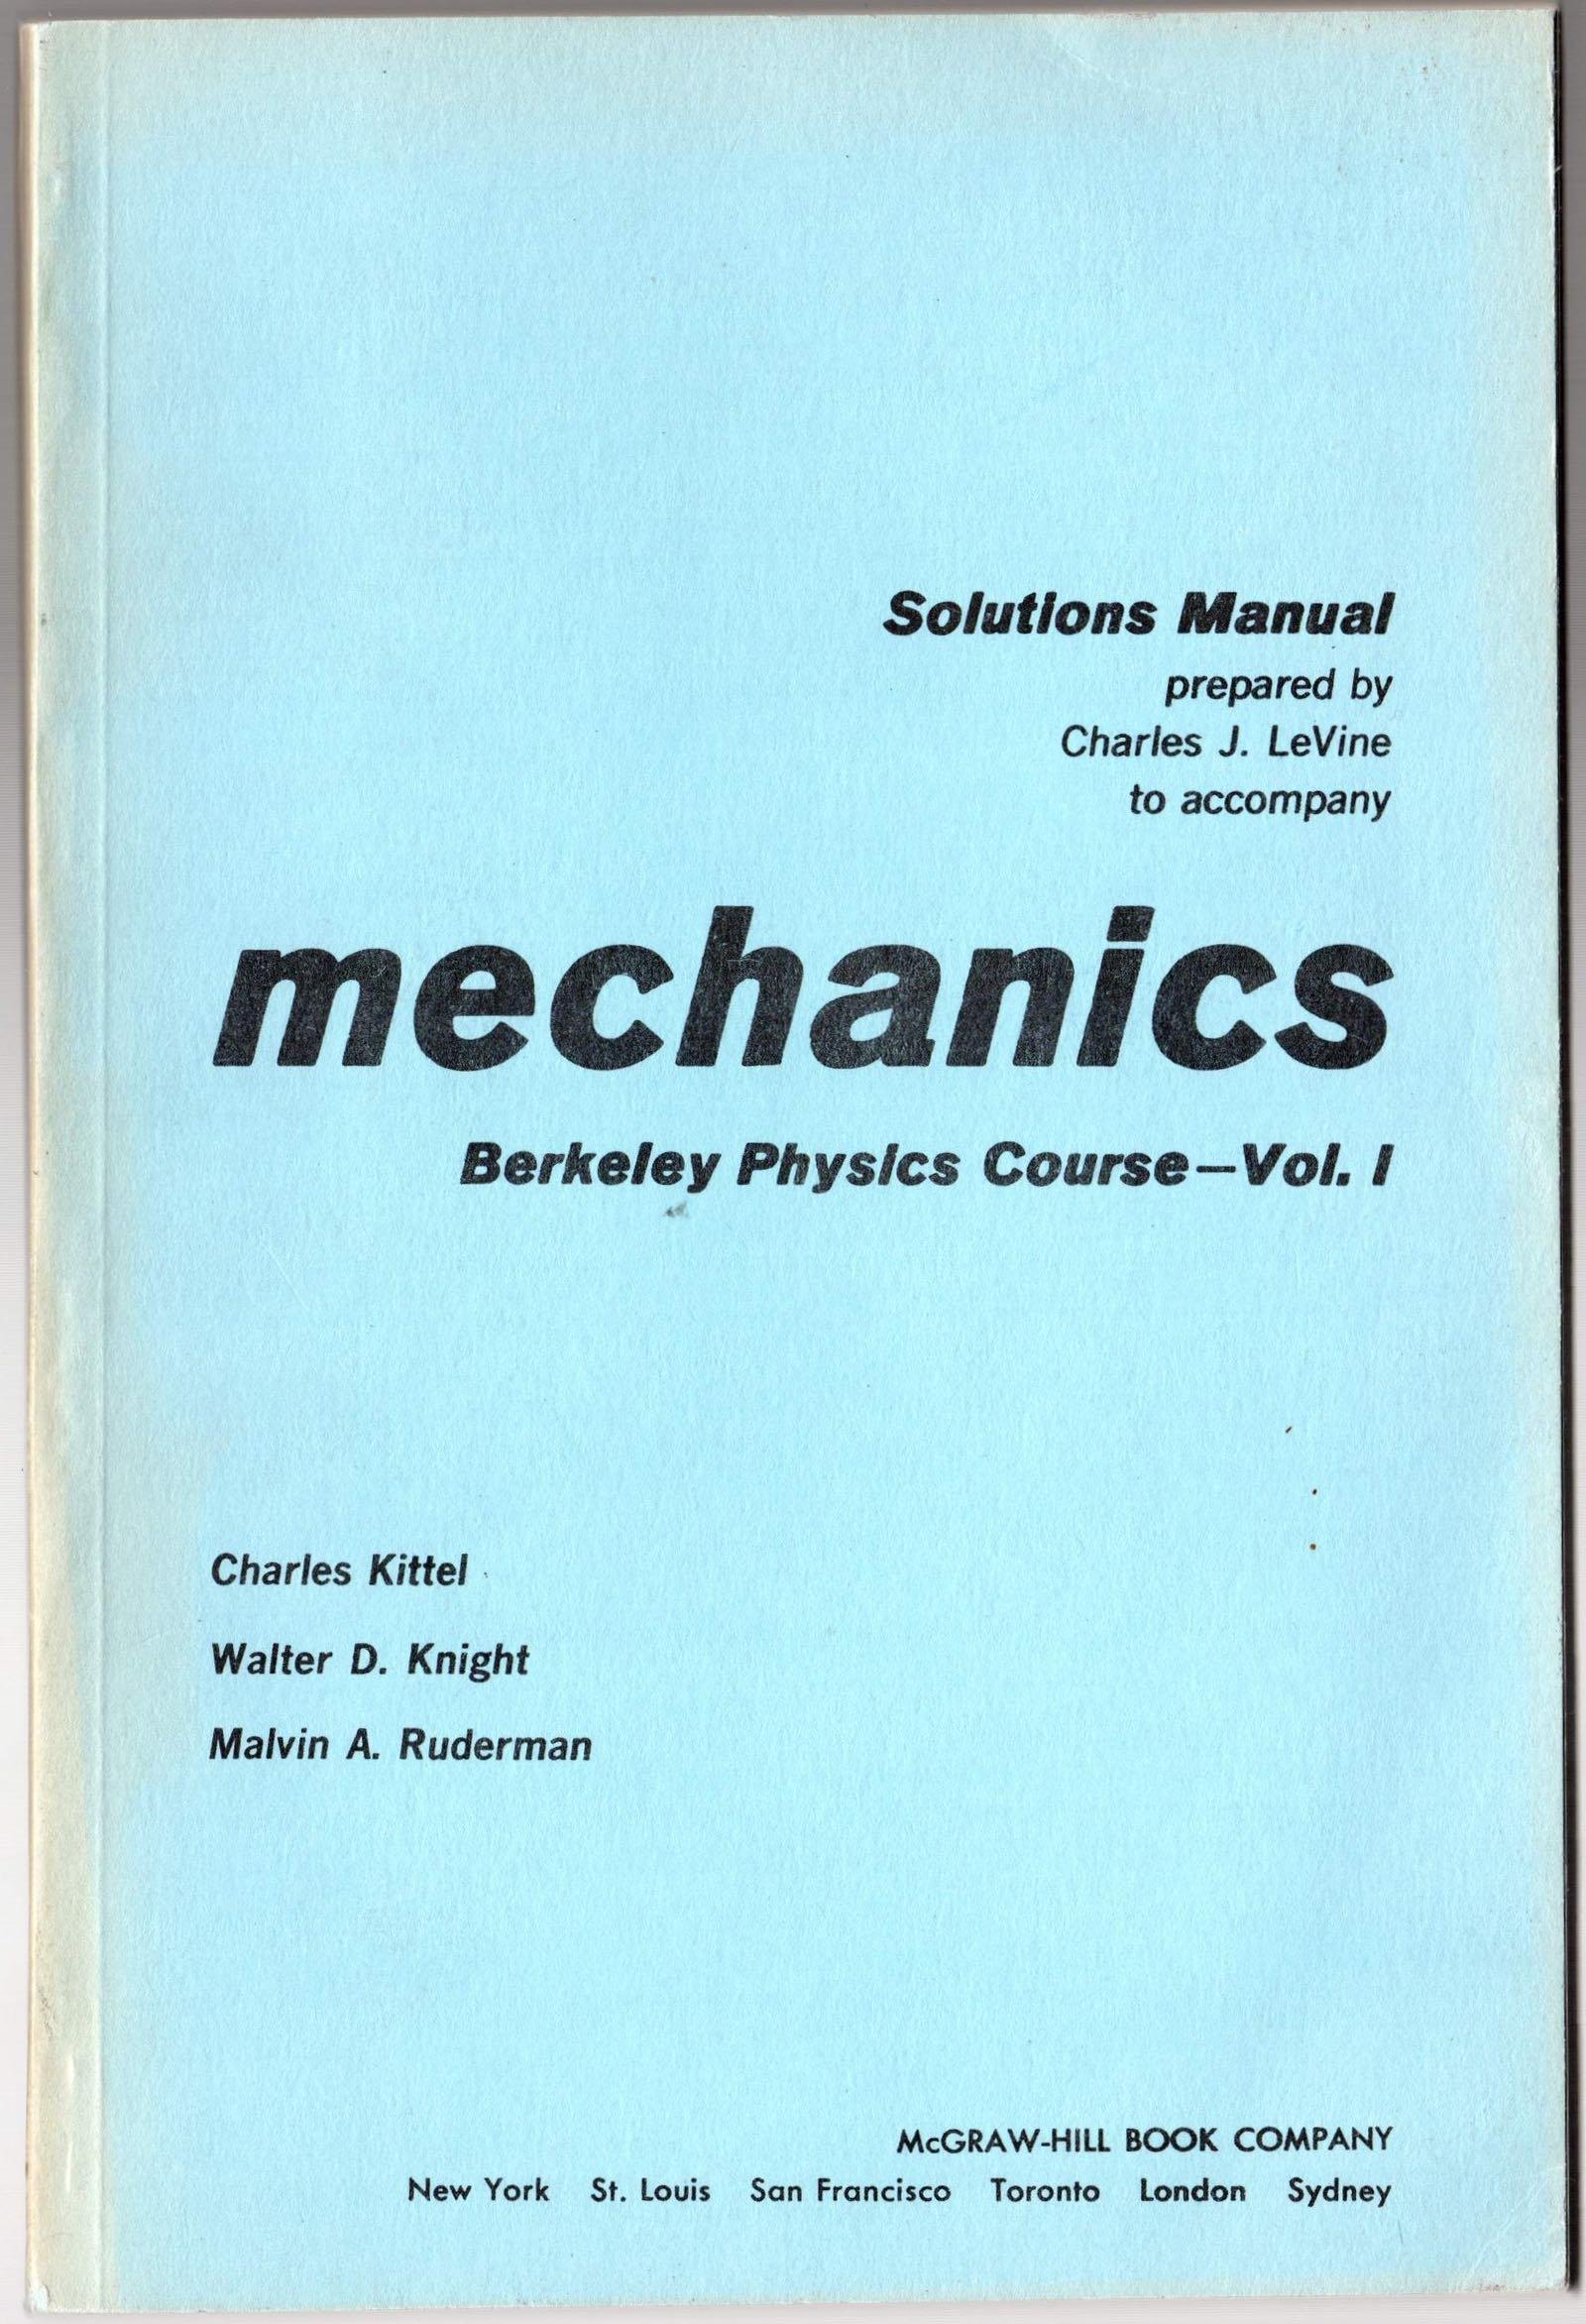 Solutions manual to accompany Mechanics, Berkeley physics course vol. 1,  [by] Charles Kittel, Walter D. Knight, Malvin A. Ruderman: Charles J  Levine: ...